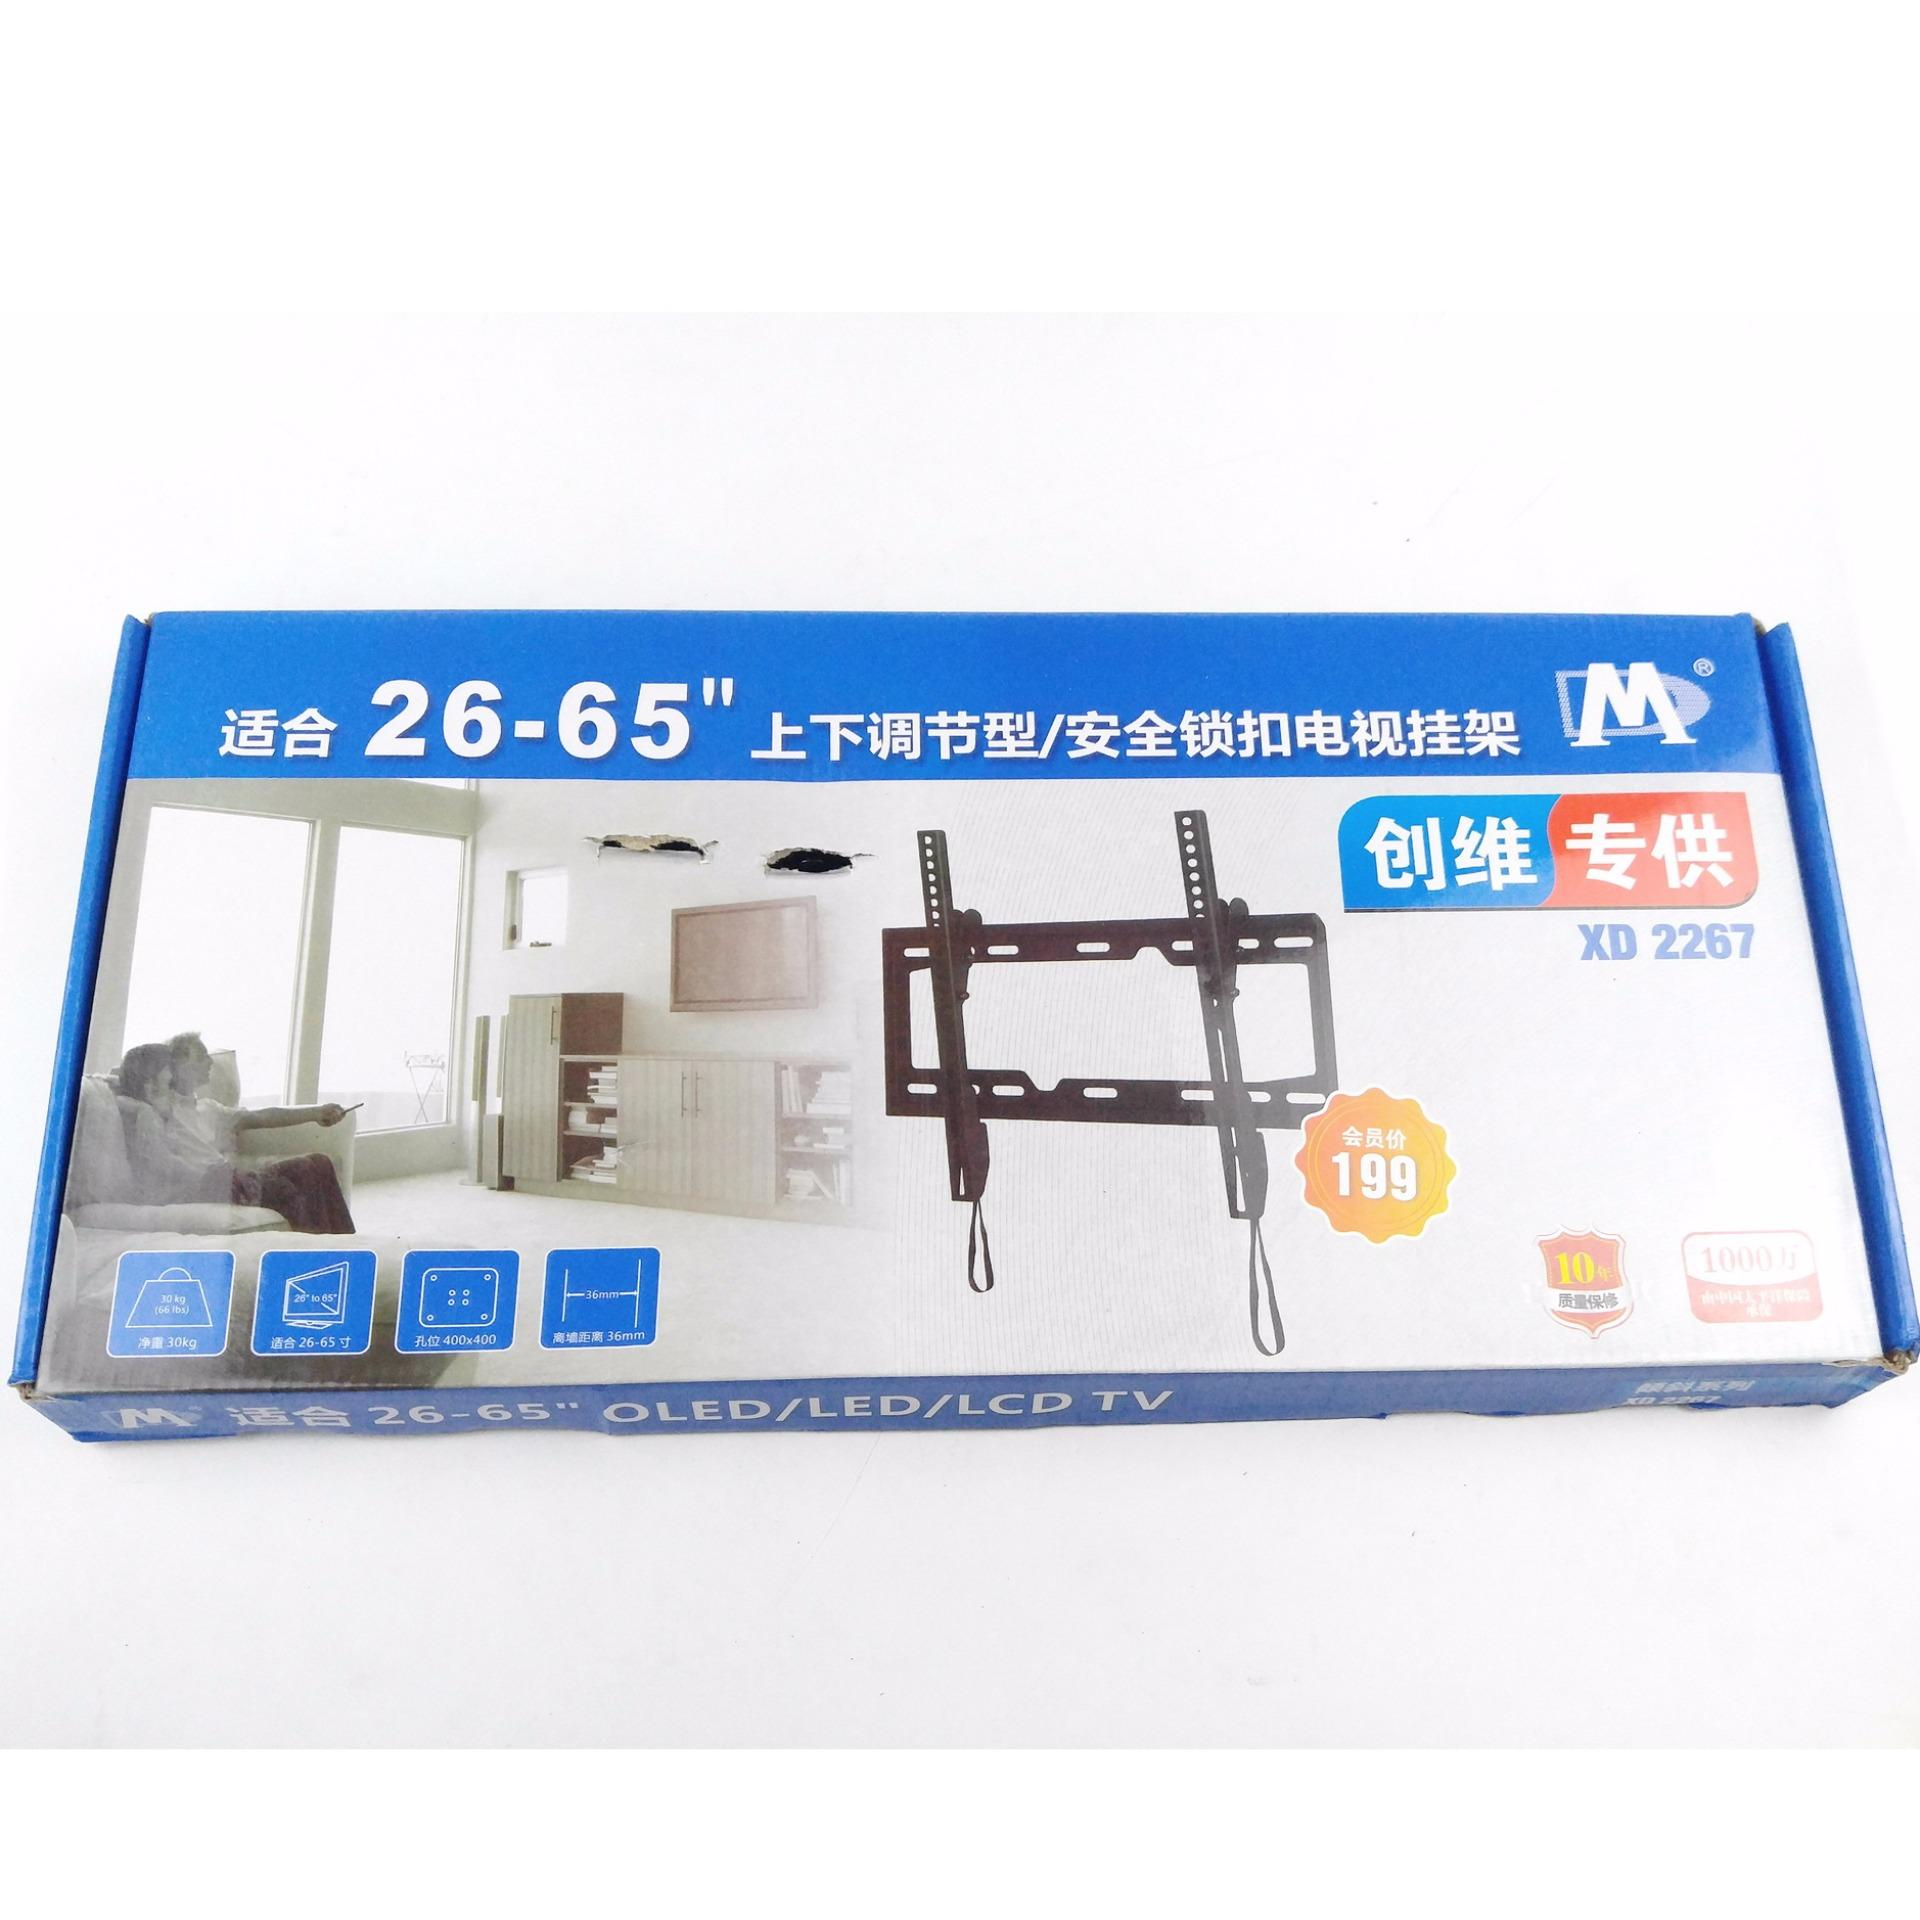 "26""-65"" Fixed LED / LCD TV Wall Mount Bracket ."